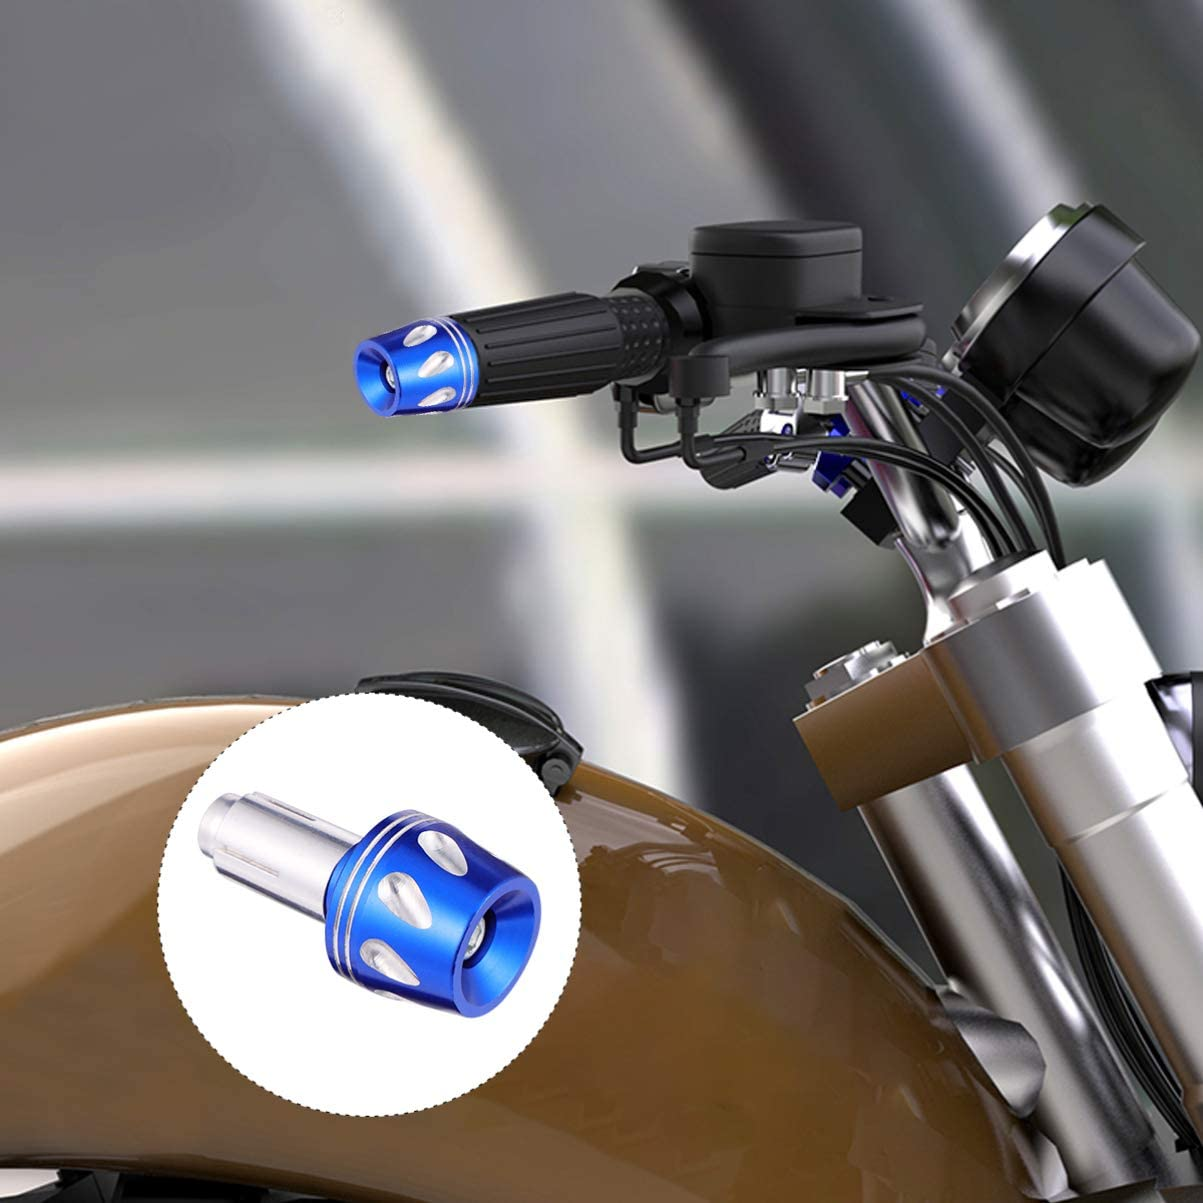 Wakauto 2pcs Motorcycle Handlebar Plugs End Caps Motorbike Bar Handlebar Grips Plugs End Slider Plug Caps Motorcycle Accessories Black